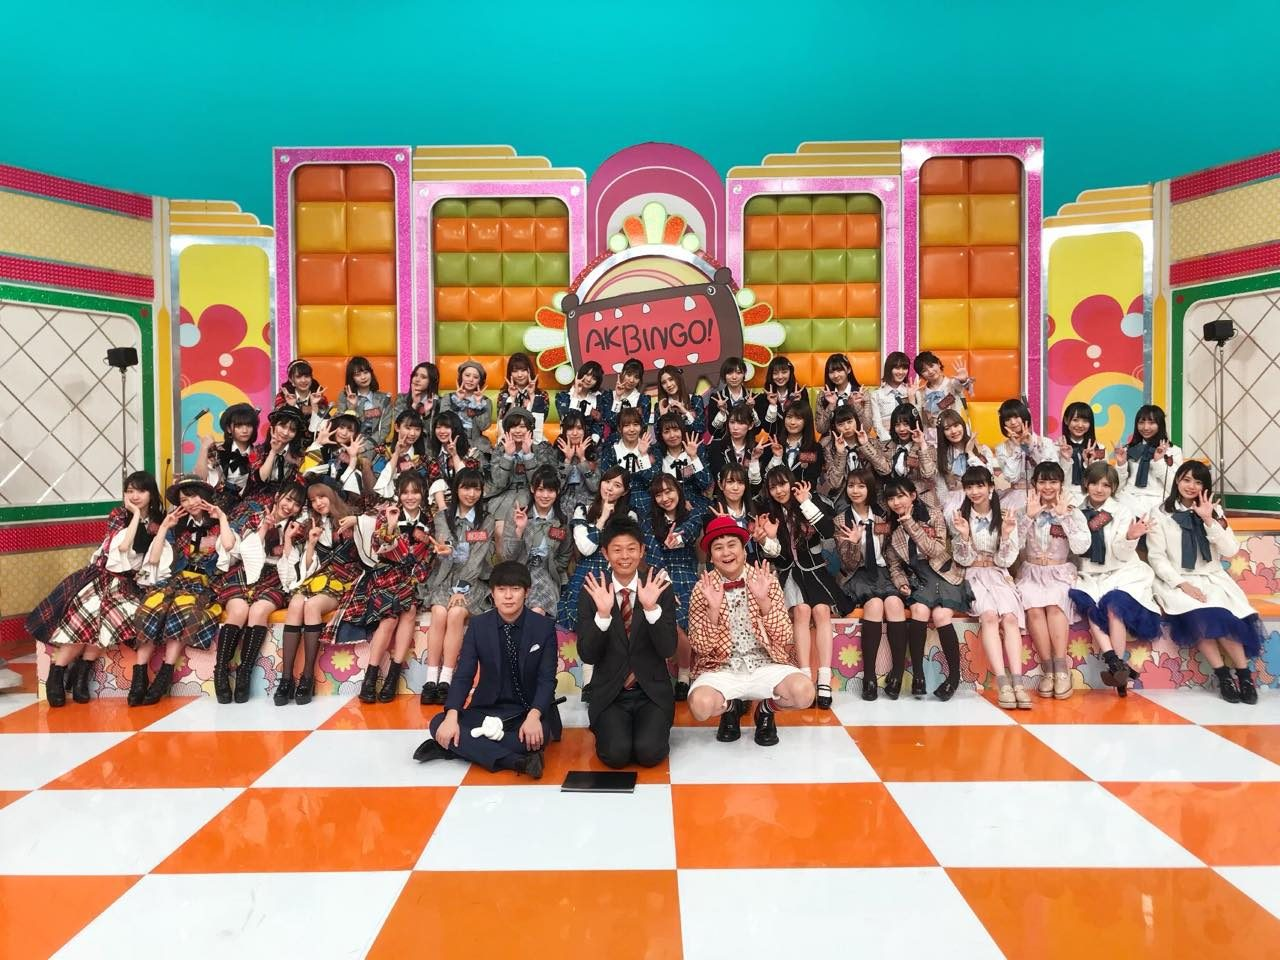 「AKBINGO!」新春恒例ラッキーガールランキング2019!48グループ全280人の手相番付発表! [1/8 24:59~]